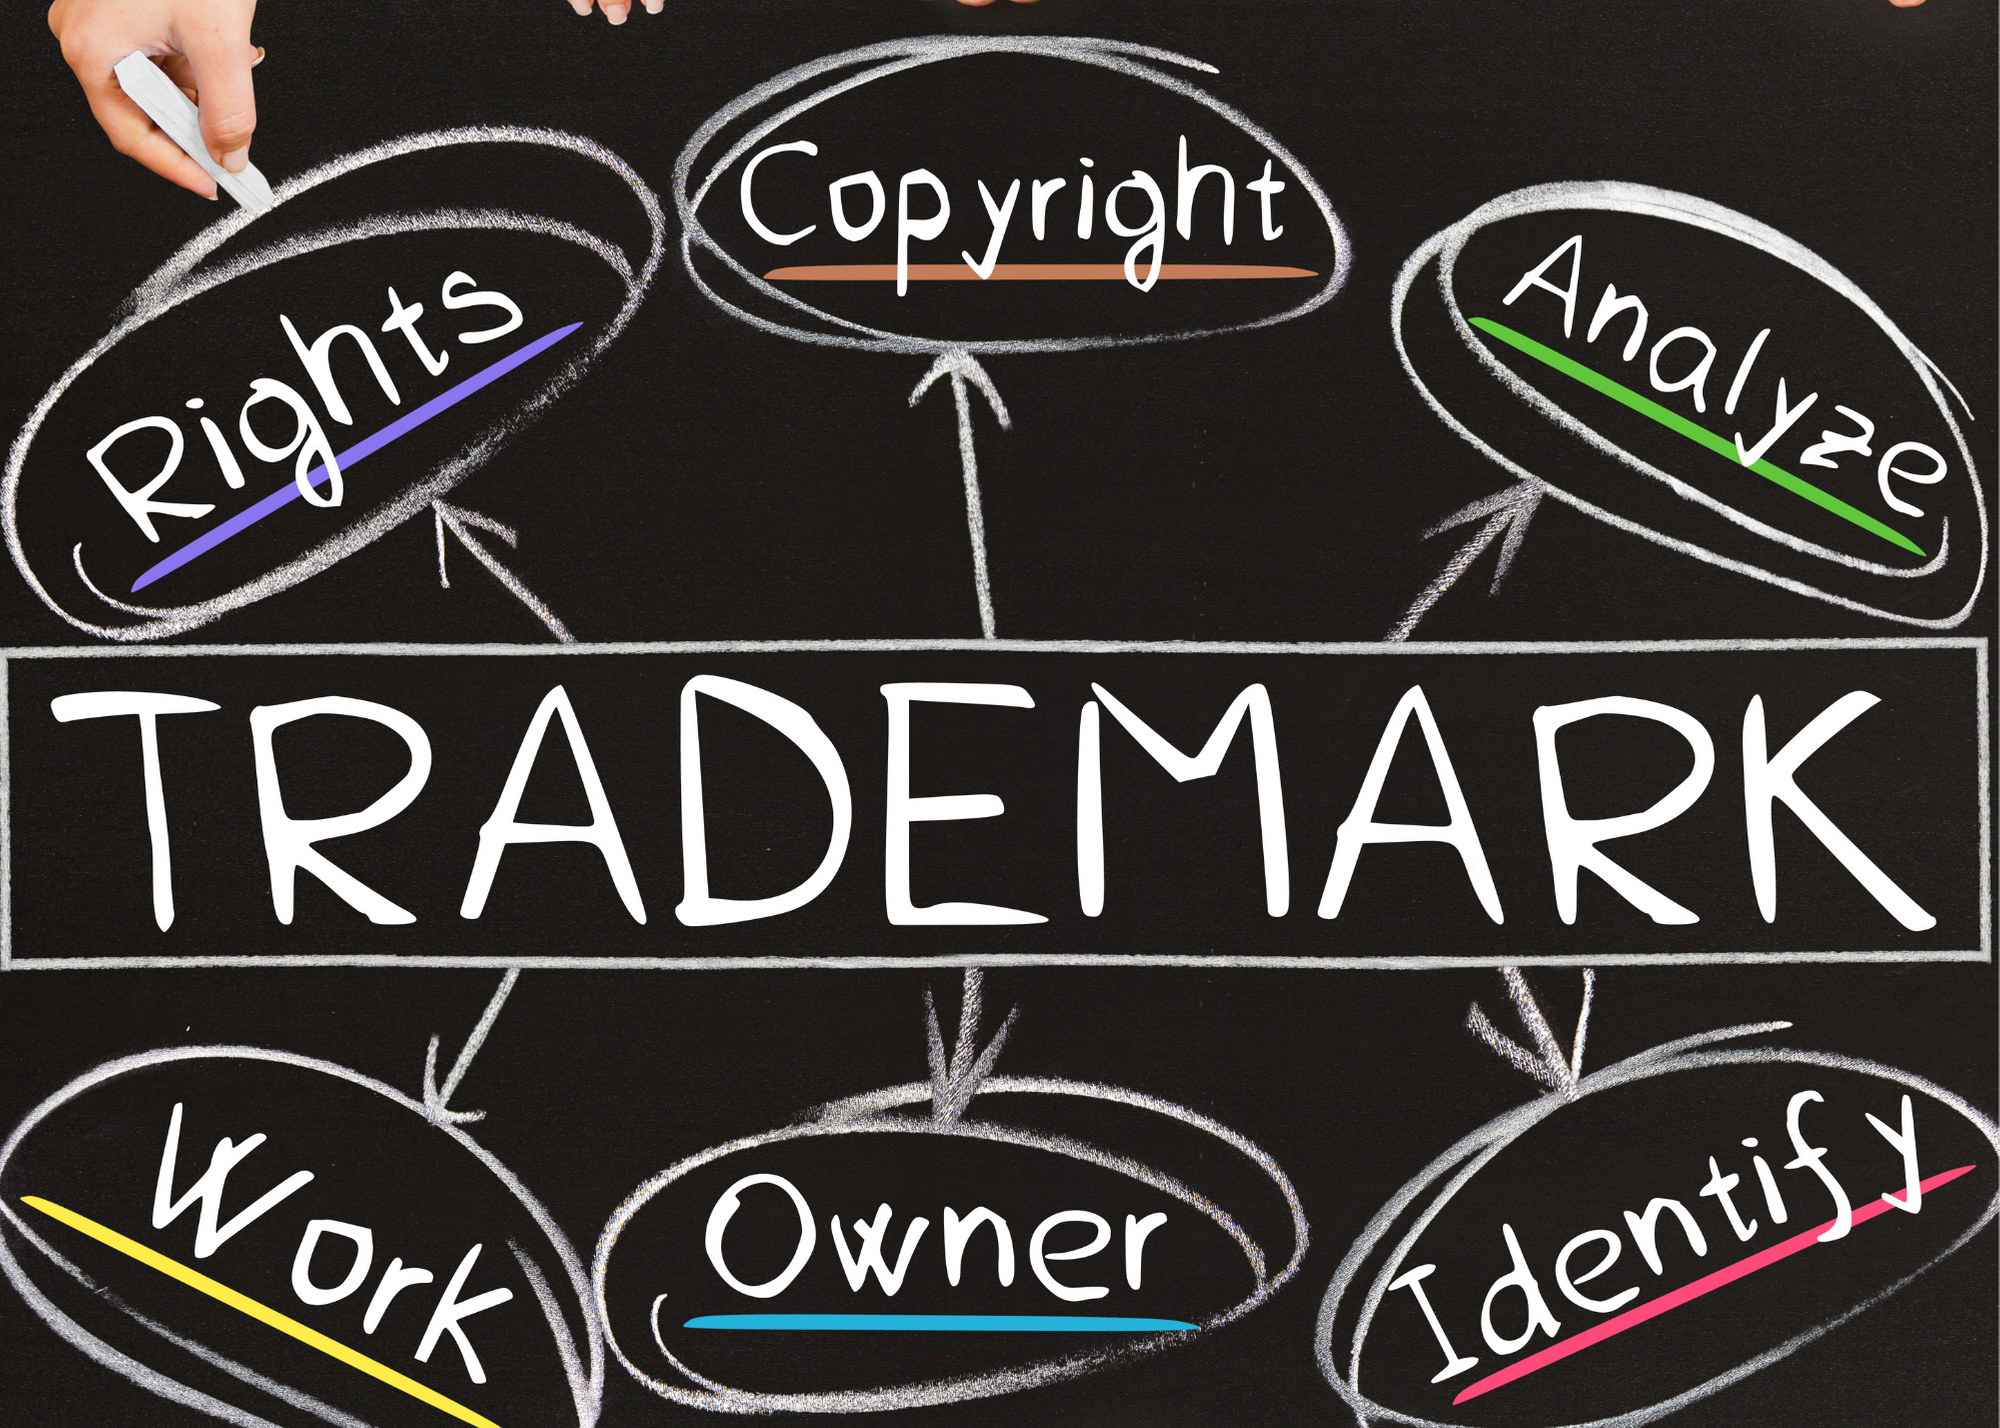 trademark versus copyright